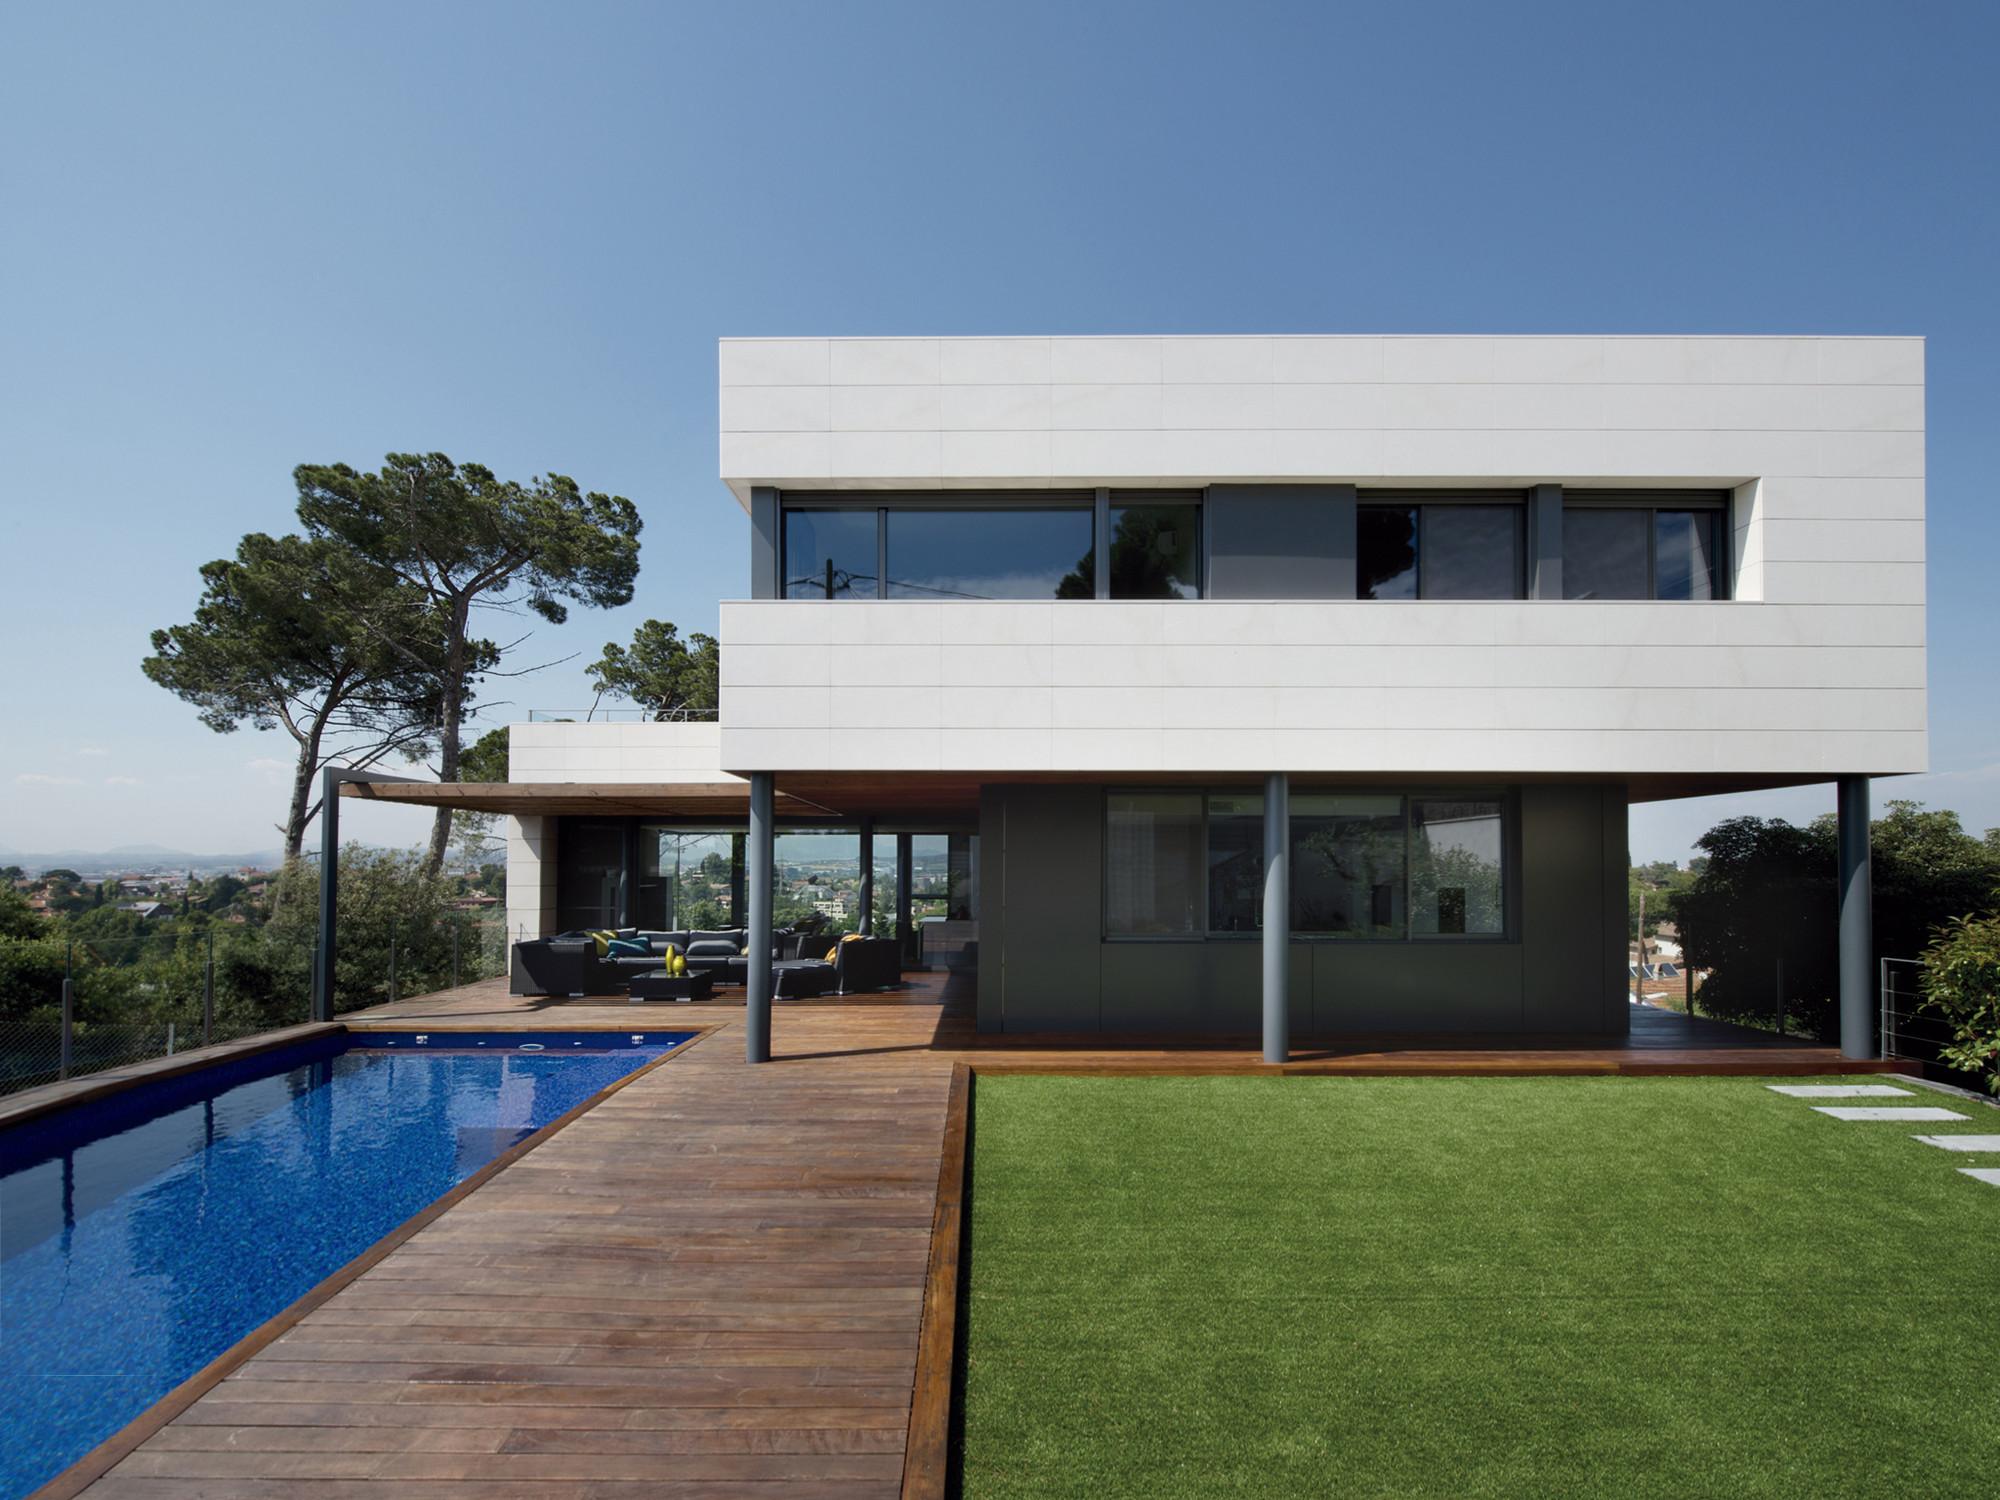 R House / Artigas Arquitectes, © Isabel Casanova